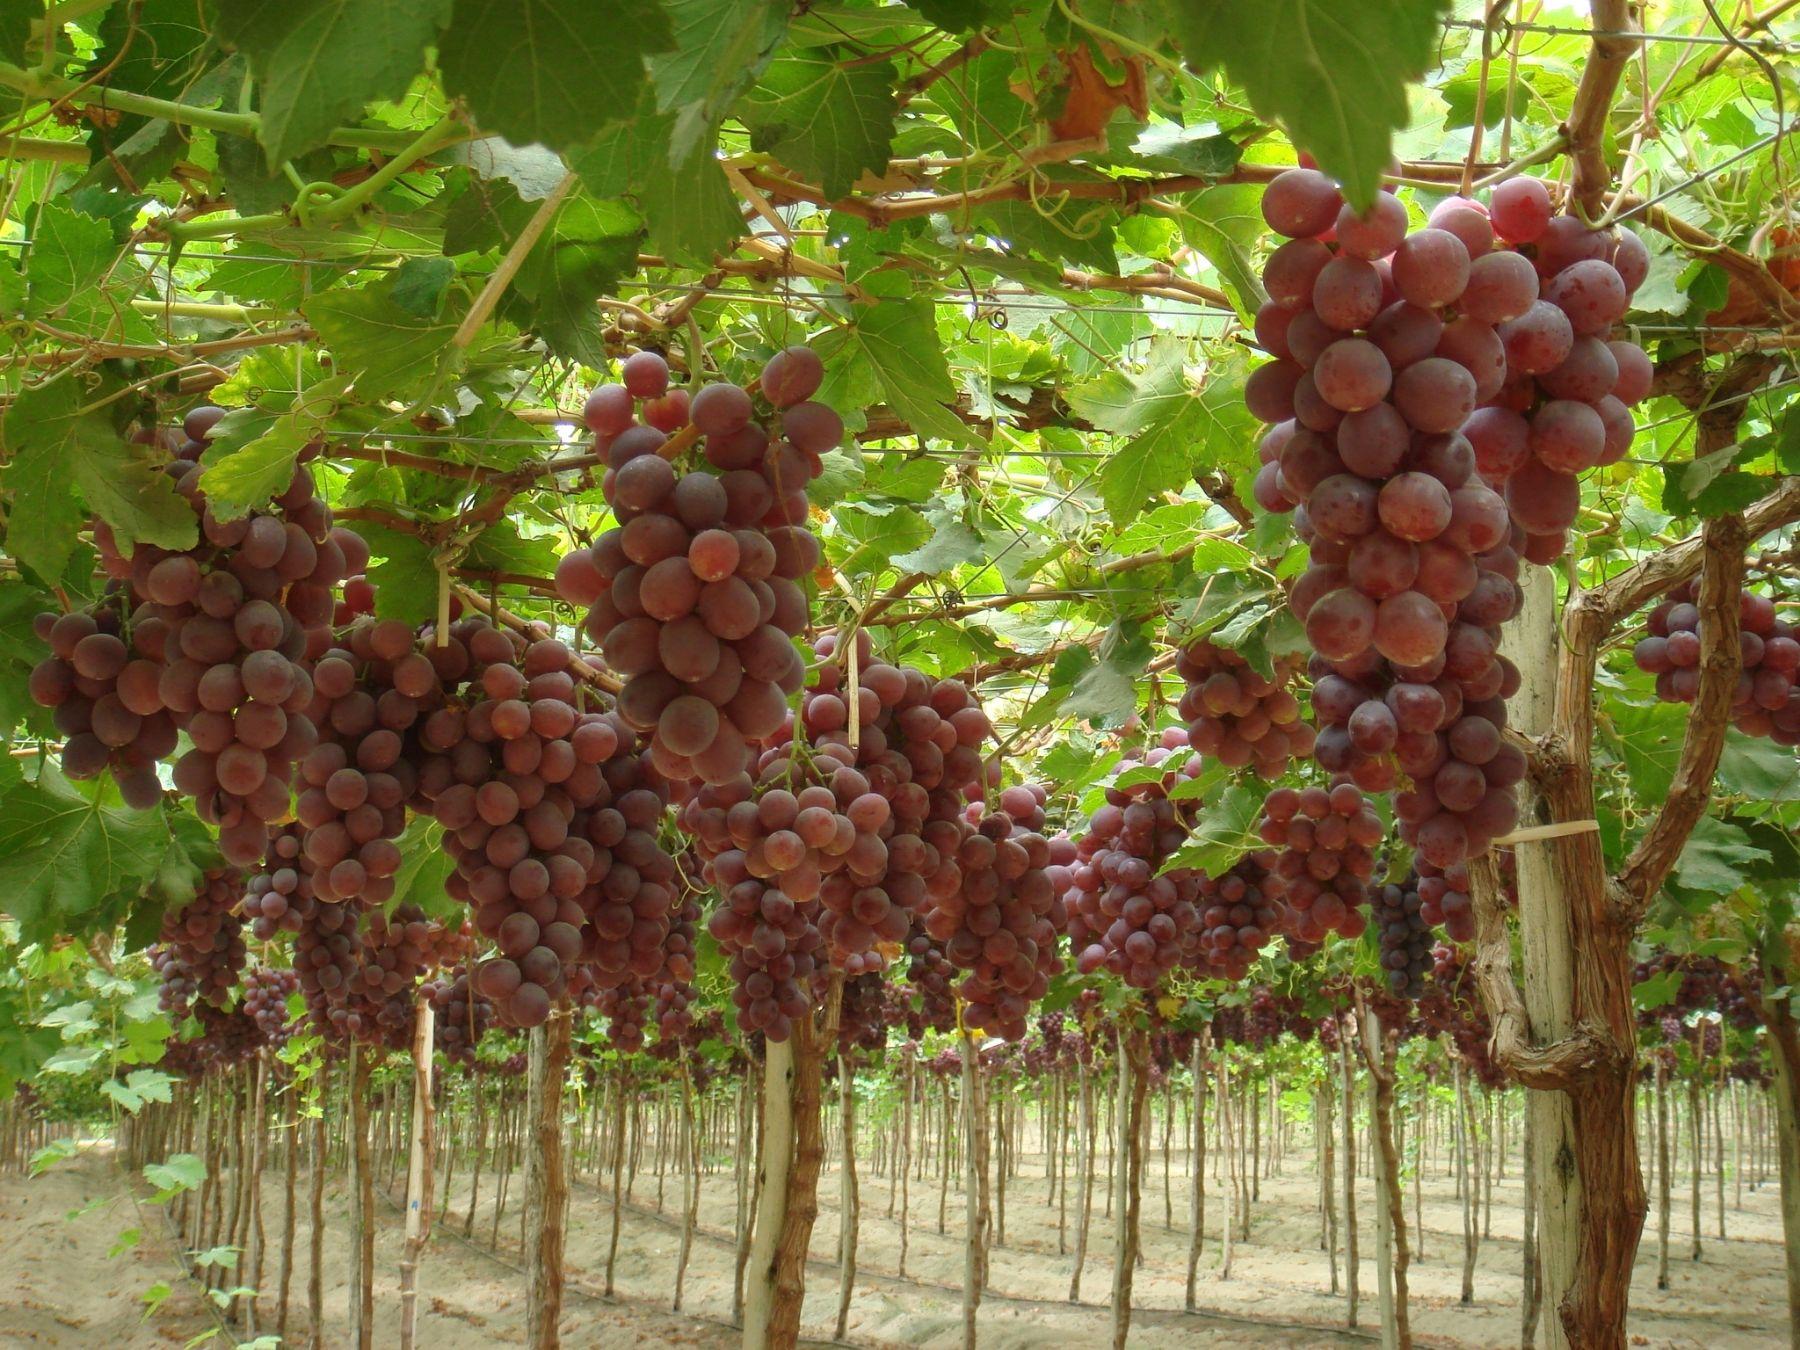 principal exportadora de uva de chile eval a adquirir